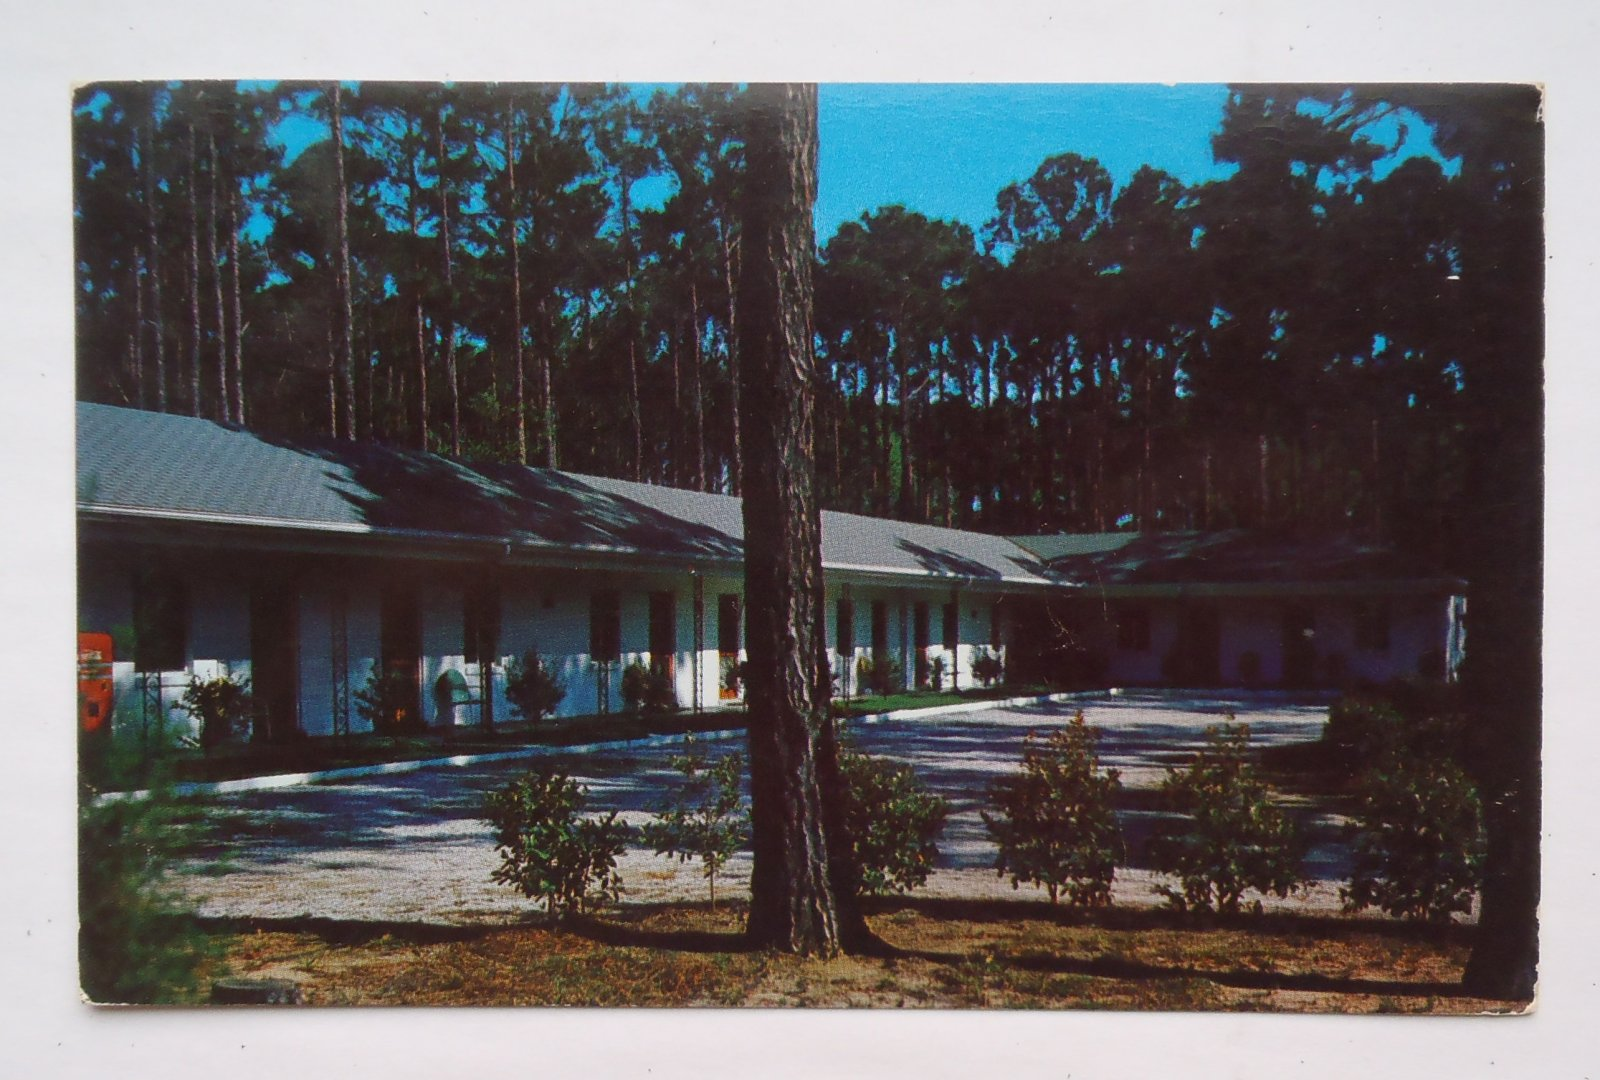 Man Cave Store Mt Pleasant Sc : Mt pleasant motel u s route mi no of